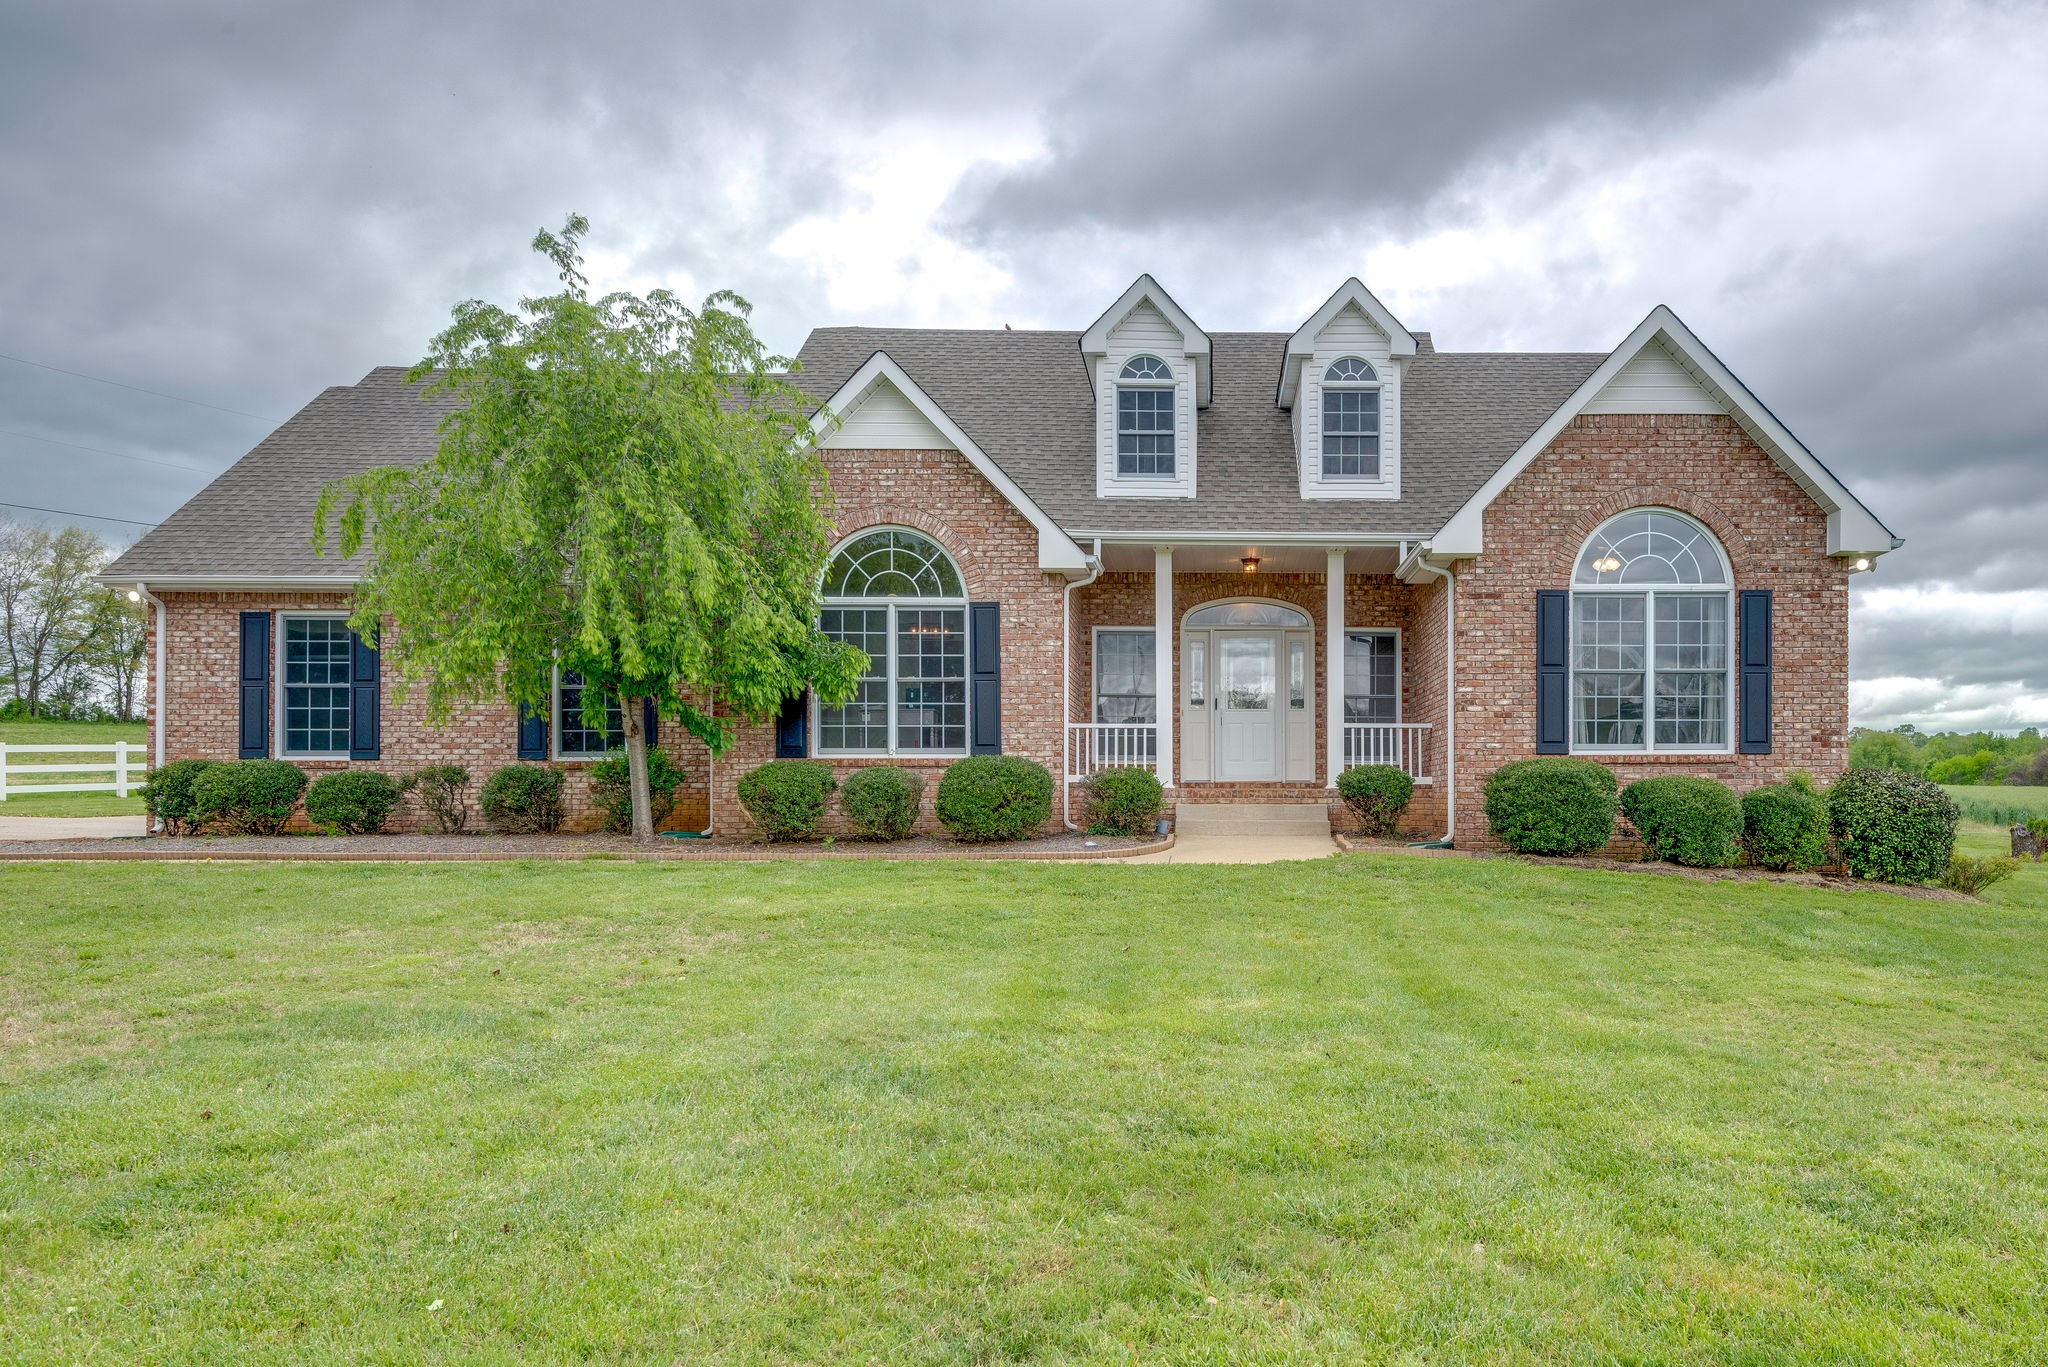 2519 Pleasant View Rd, Pleasant View, TN 37146 - Pleasant View, TN real estate listing